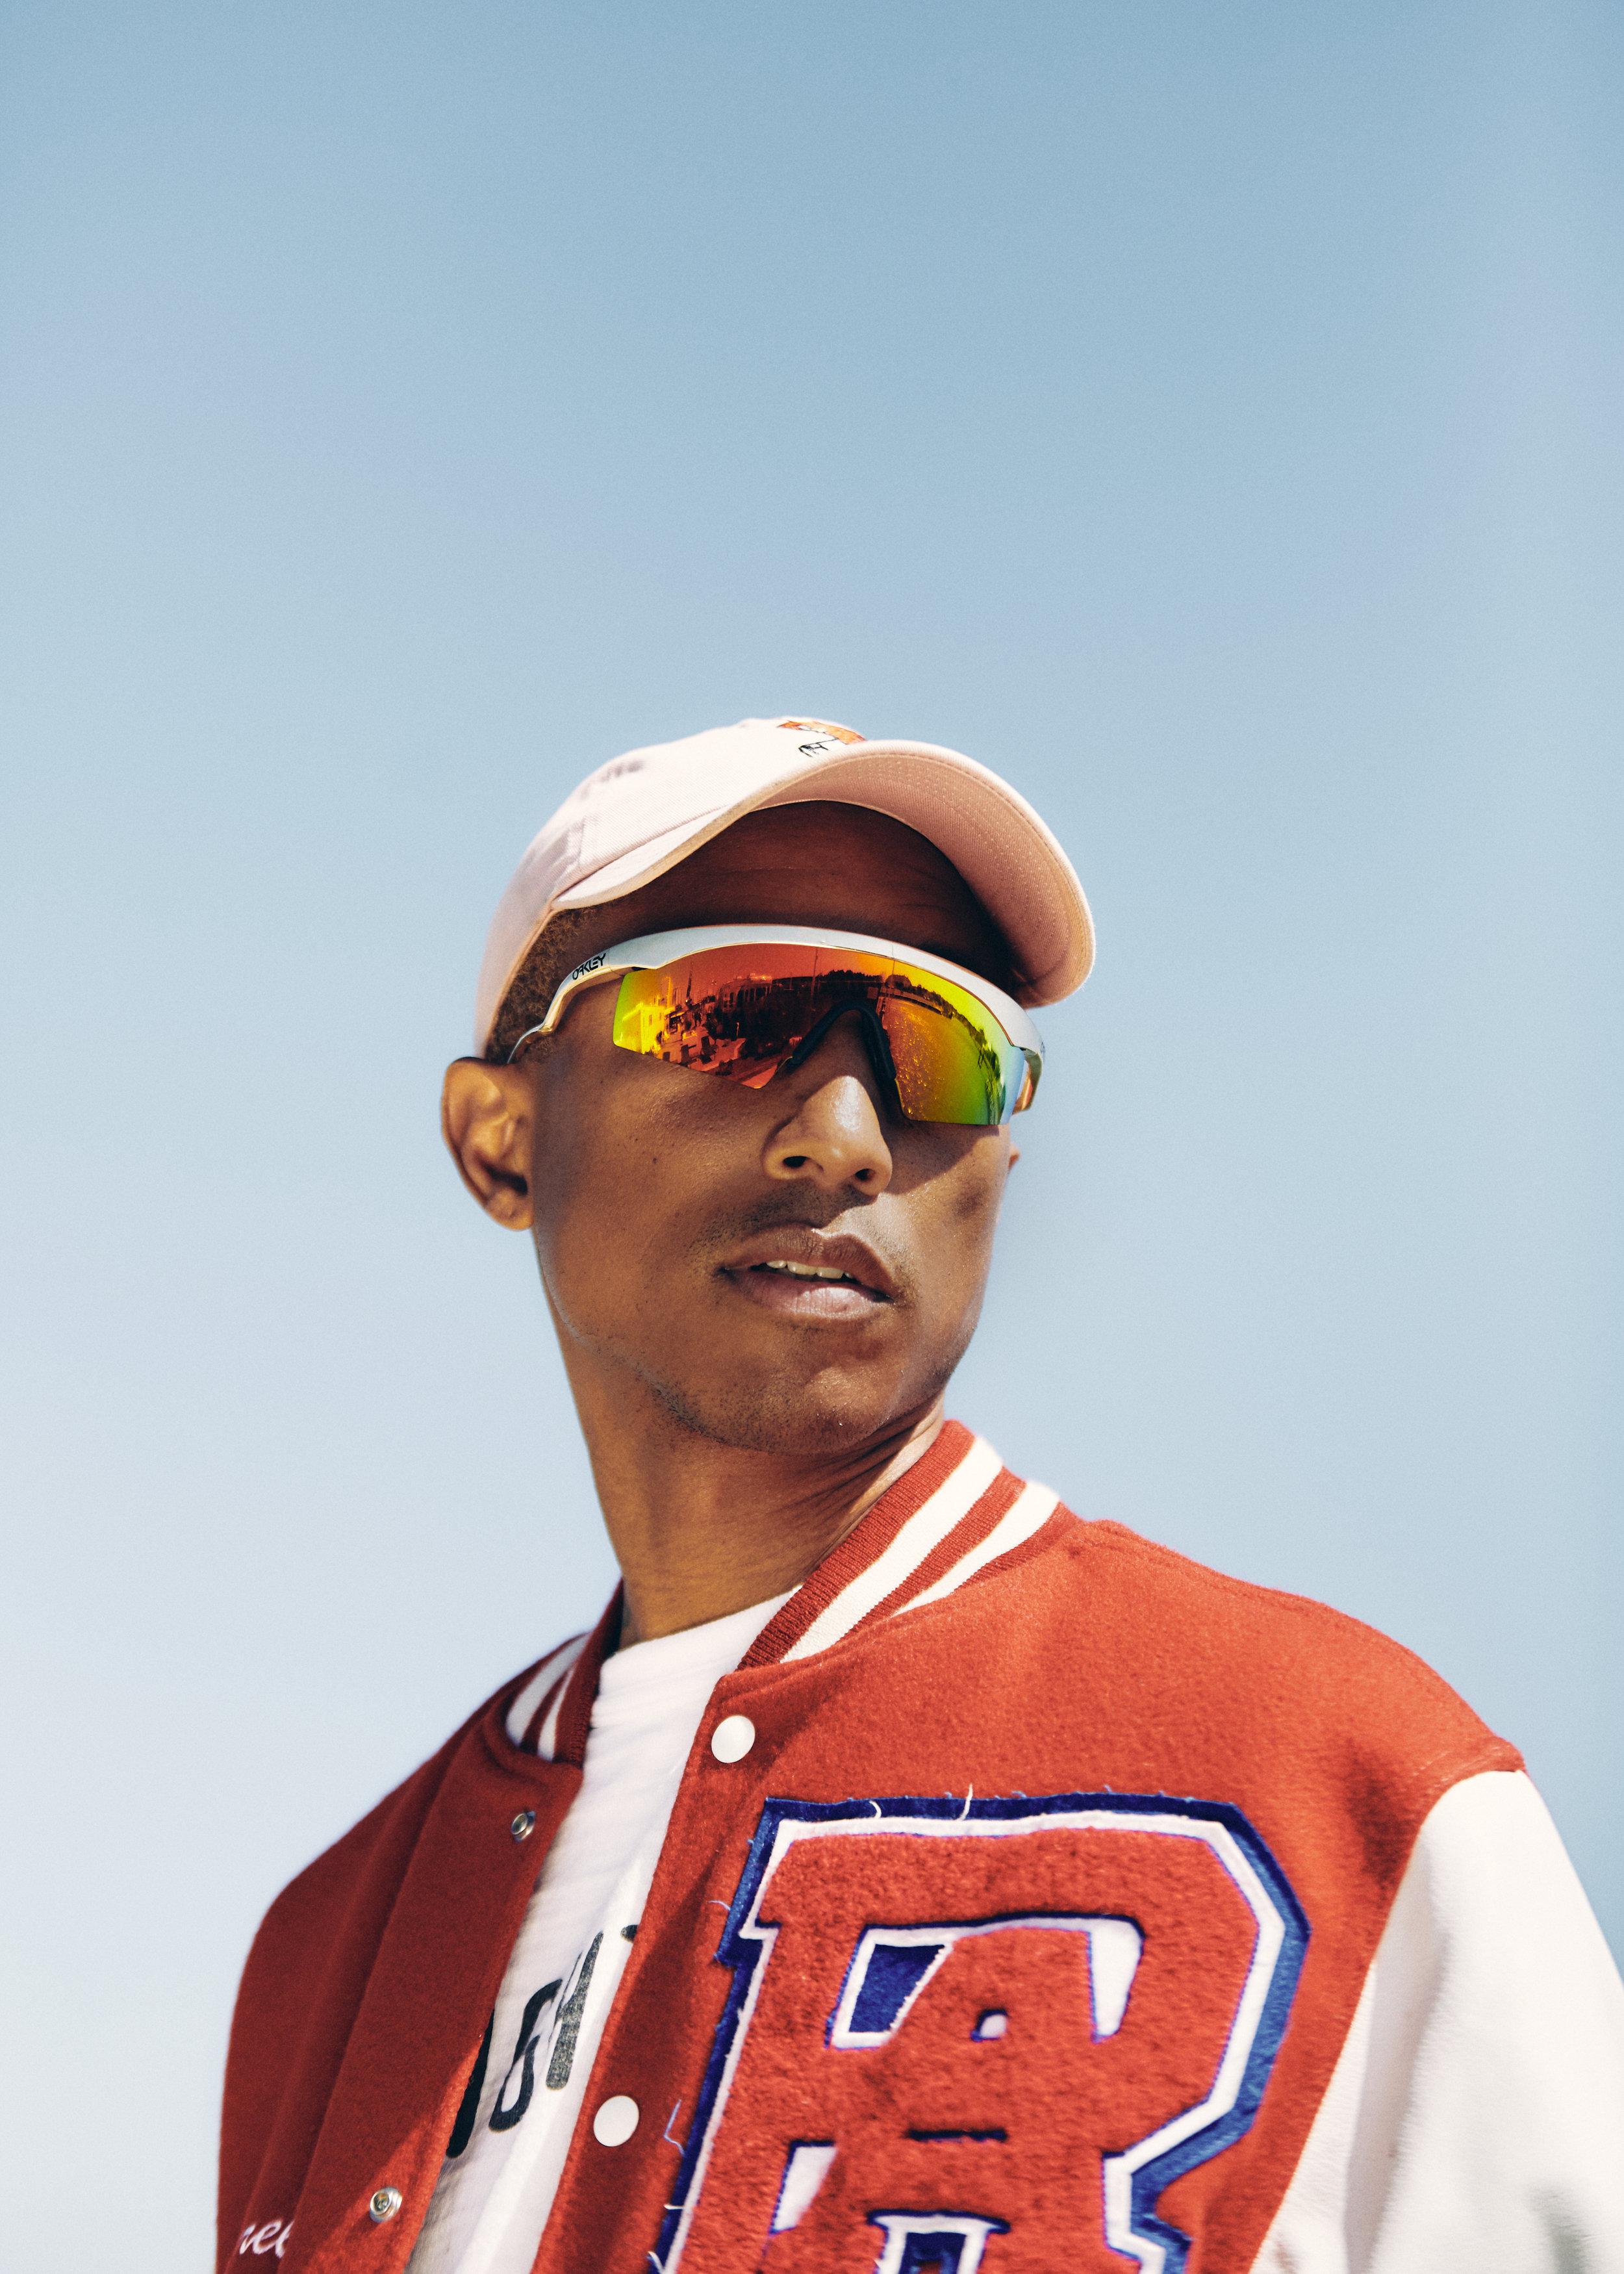 Pharrell Williams for GQ.com